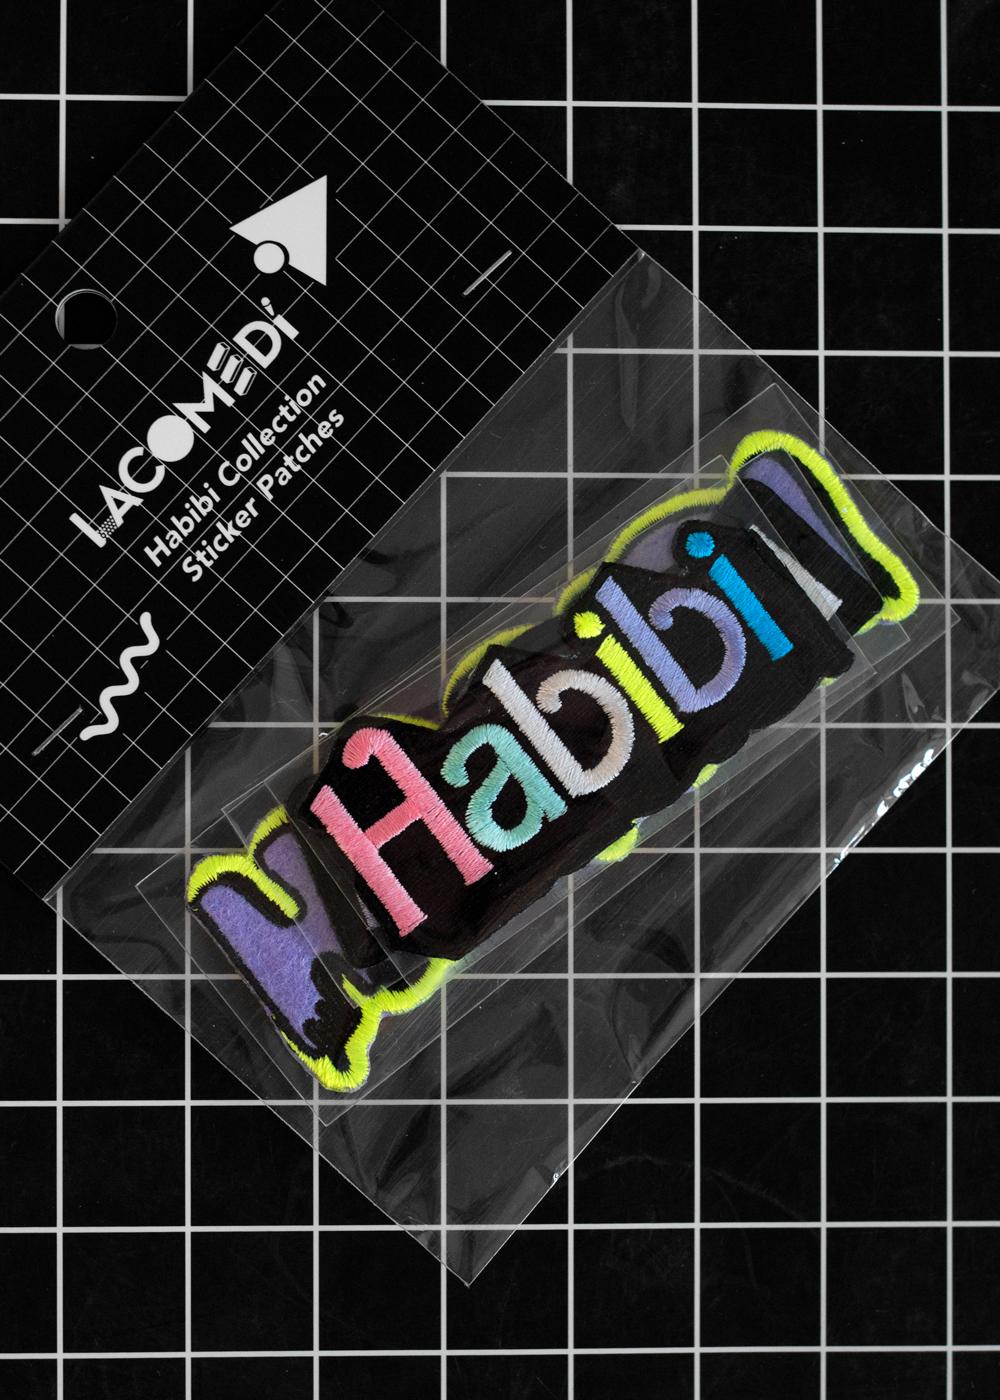 HabibiPatch